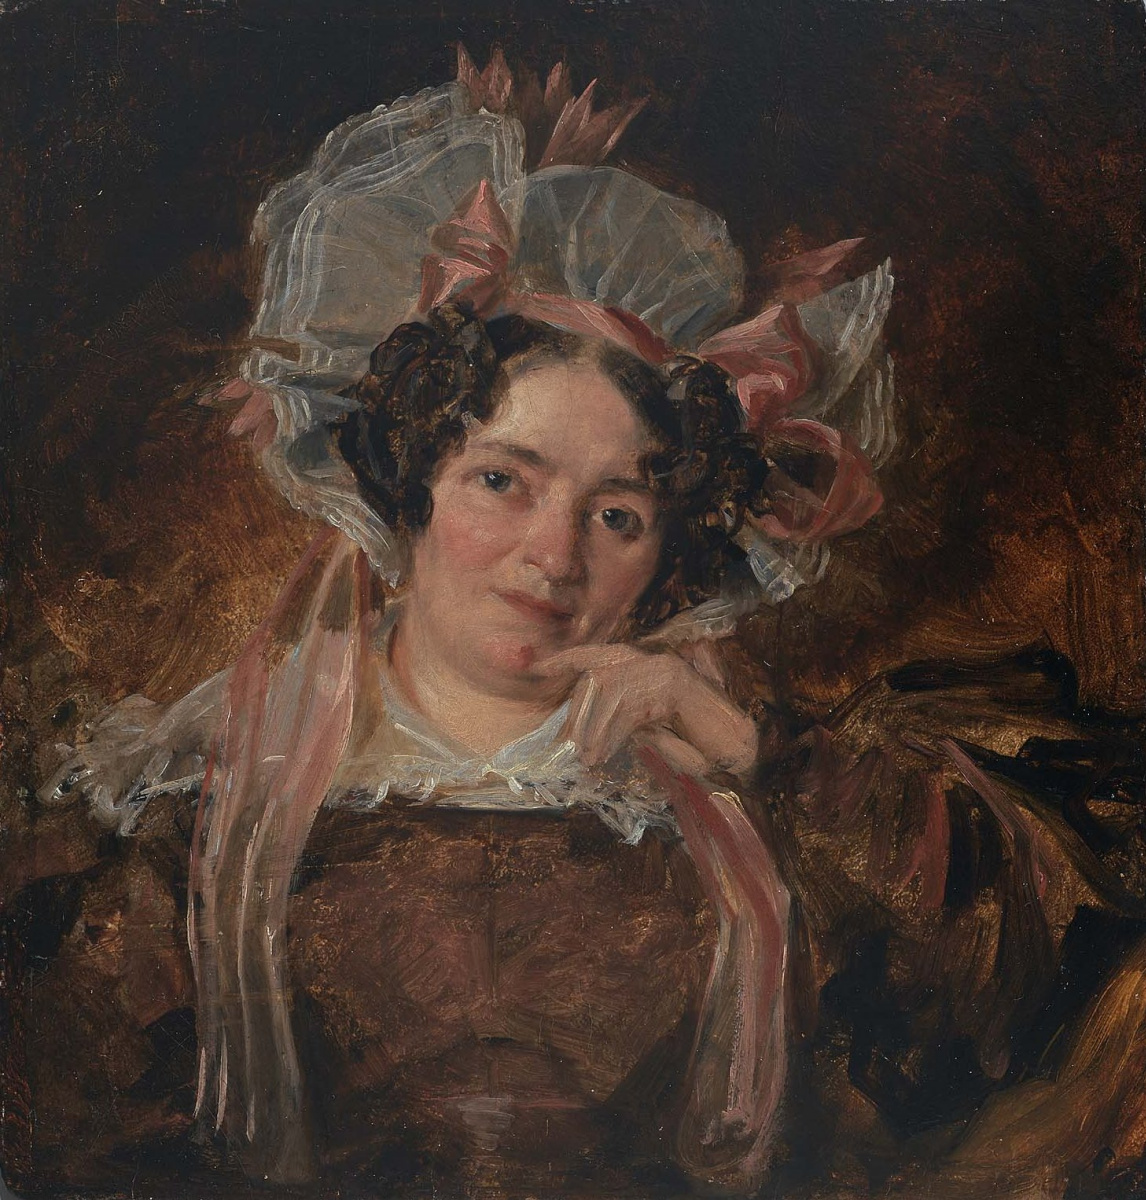 John Constable. Portrait of a woman